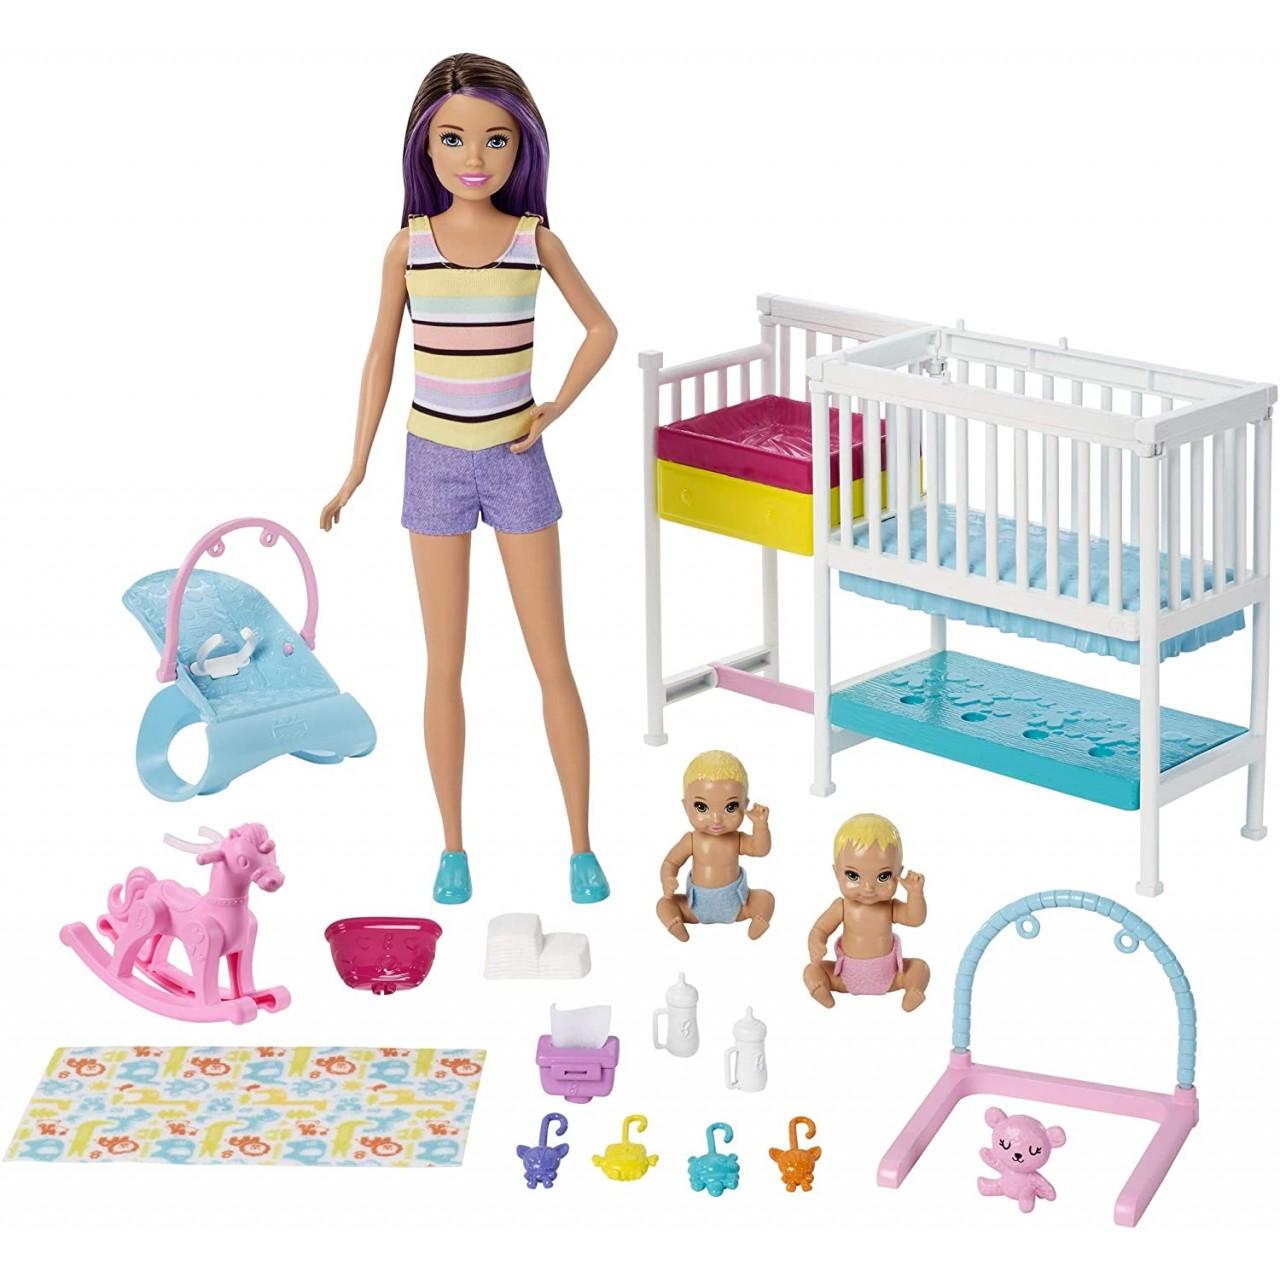 "Набор Барби Скиппер няня ""Уход за новорожденными"" (GFL38) Barbie Skipper Babysitters"